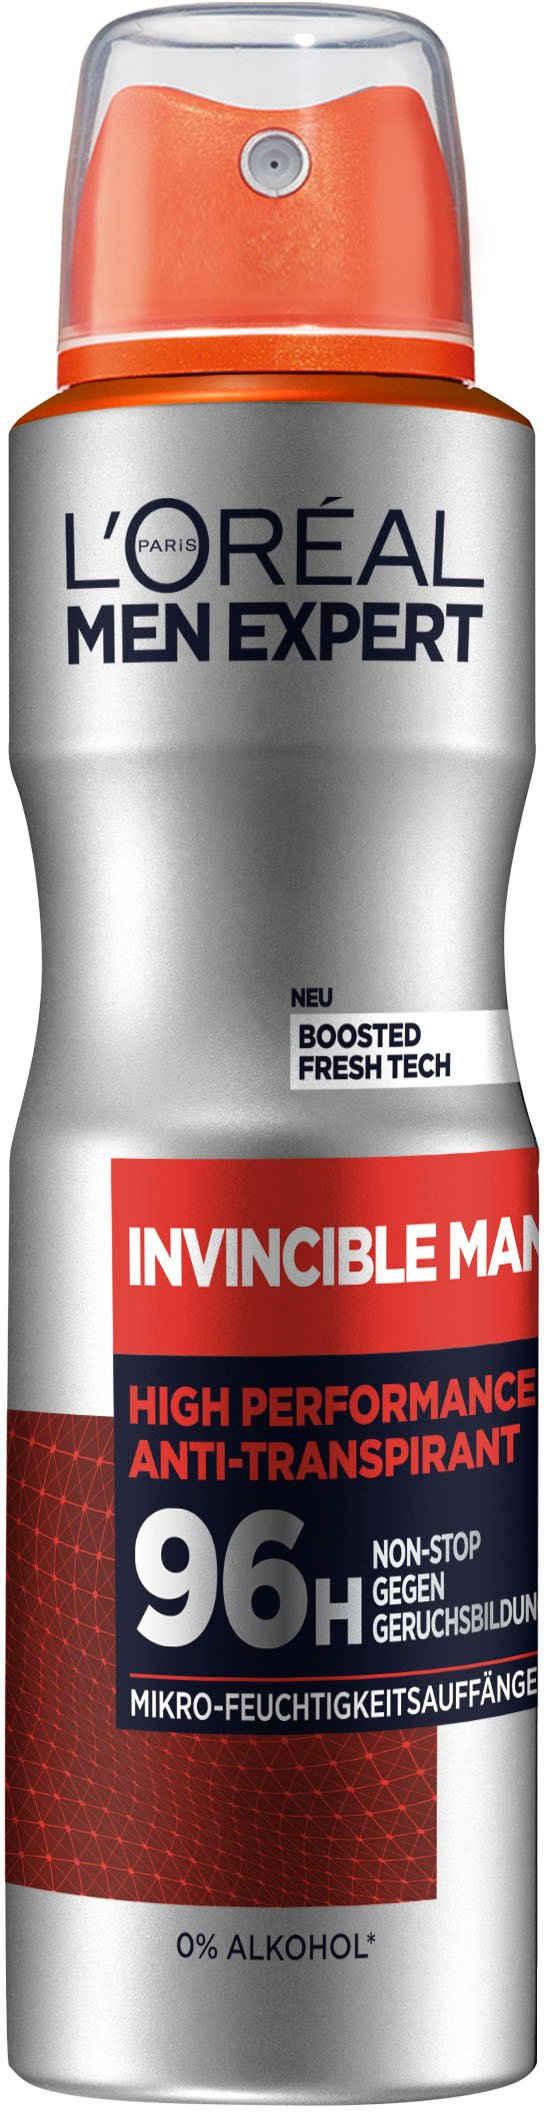 L'ORÉAL PARIS MEN EXPERT Deo-Spray »Invincible Man Anti-Transpirant«, 96H Schutz vor Gerüchen